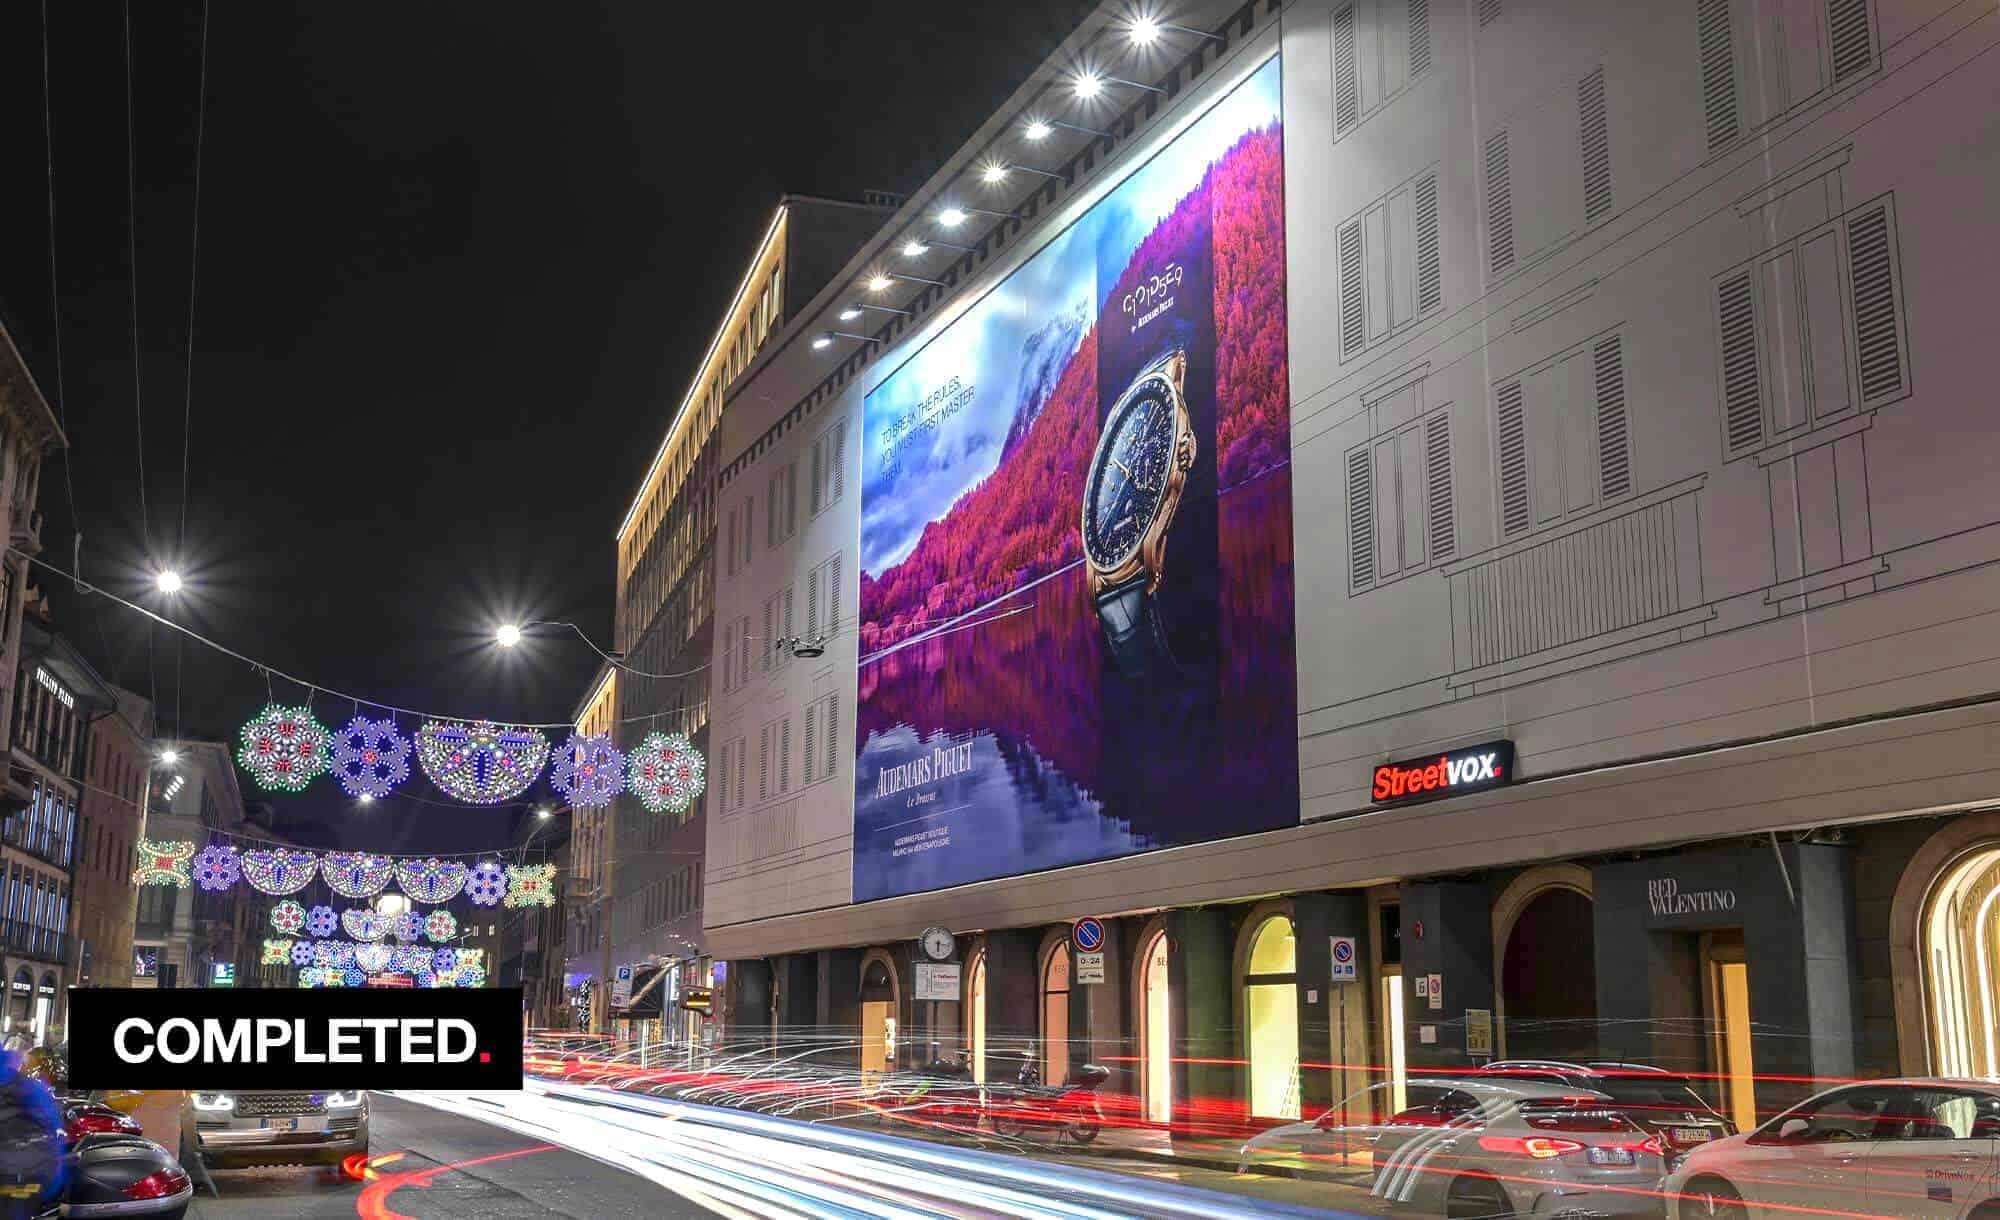 Maxi Affisione a Milano in Via Venezia 6 con Audemars Piguet (Luxury)